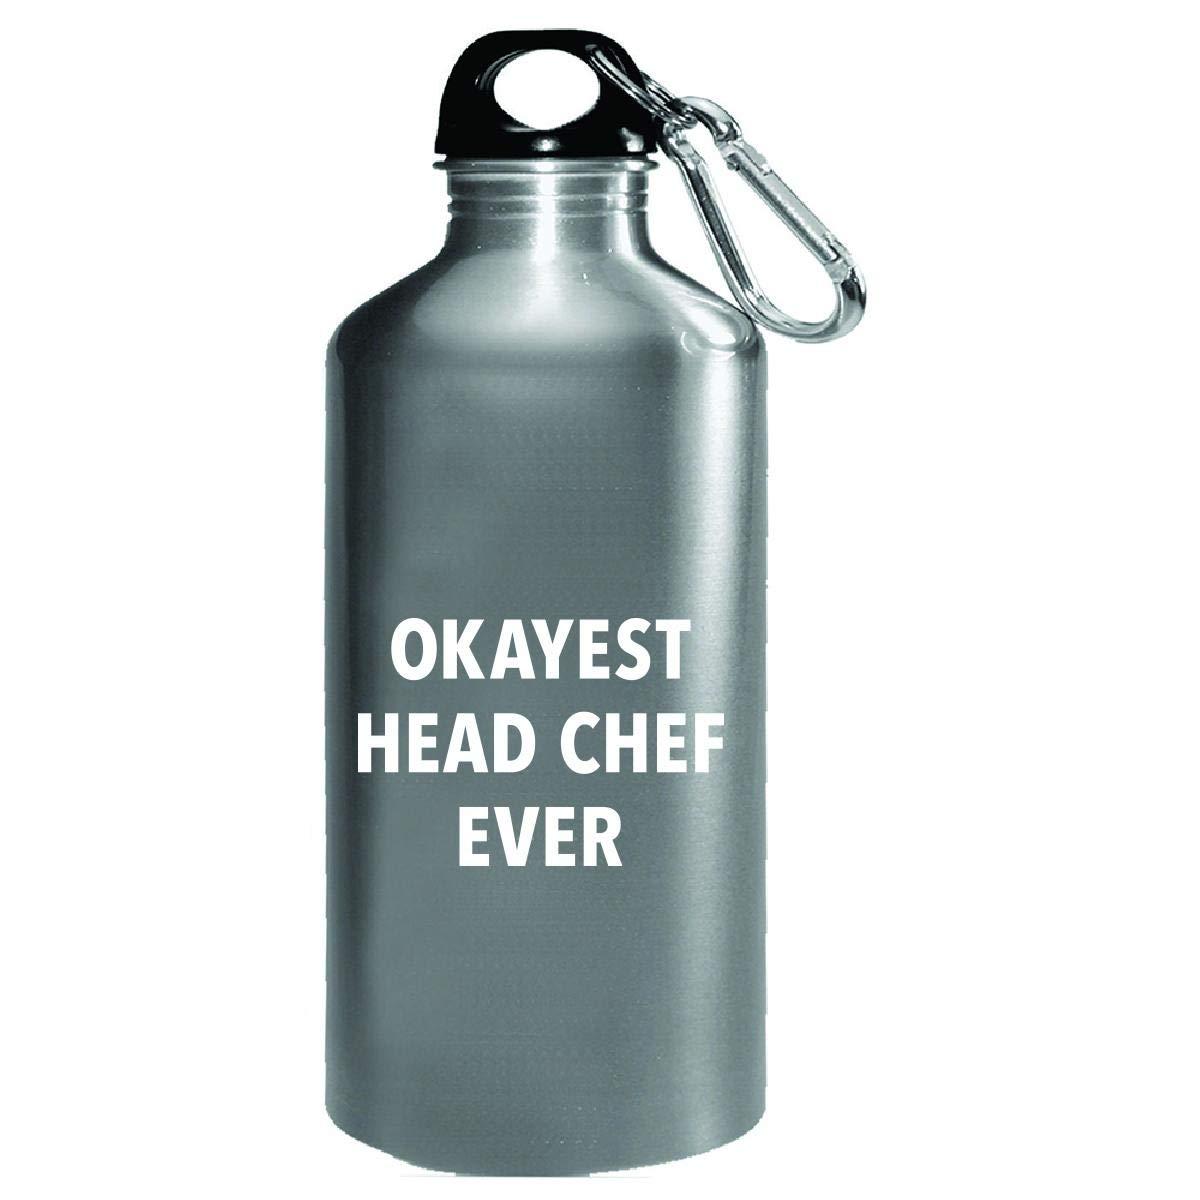 Okayest Head Chef Ever Sarcastic おもしろい言葉 オフィスギフト 水筒 B07G96XCRG